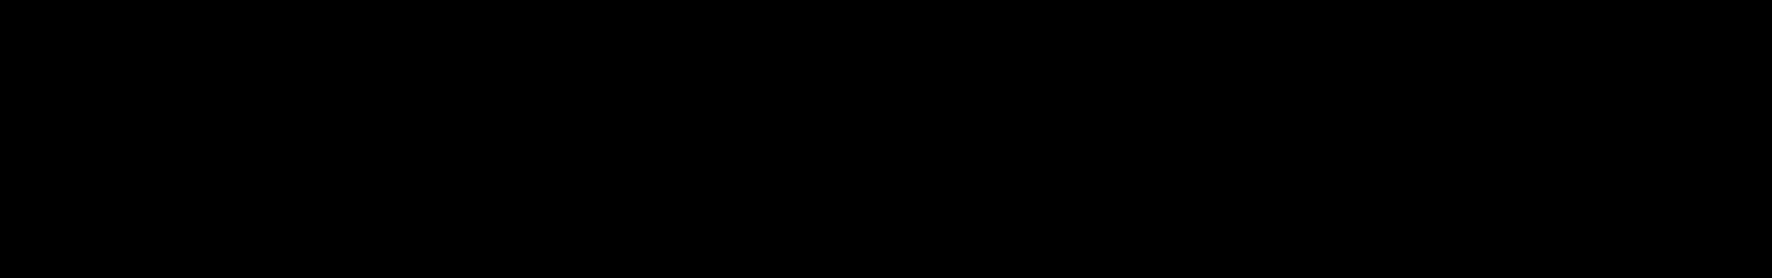 Flovate Leap logo